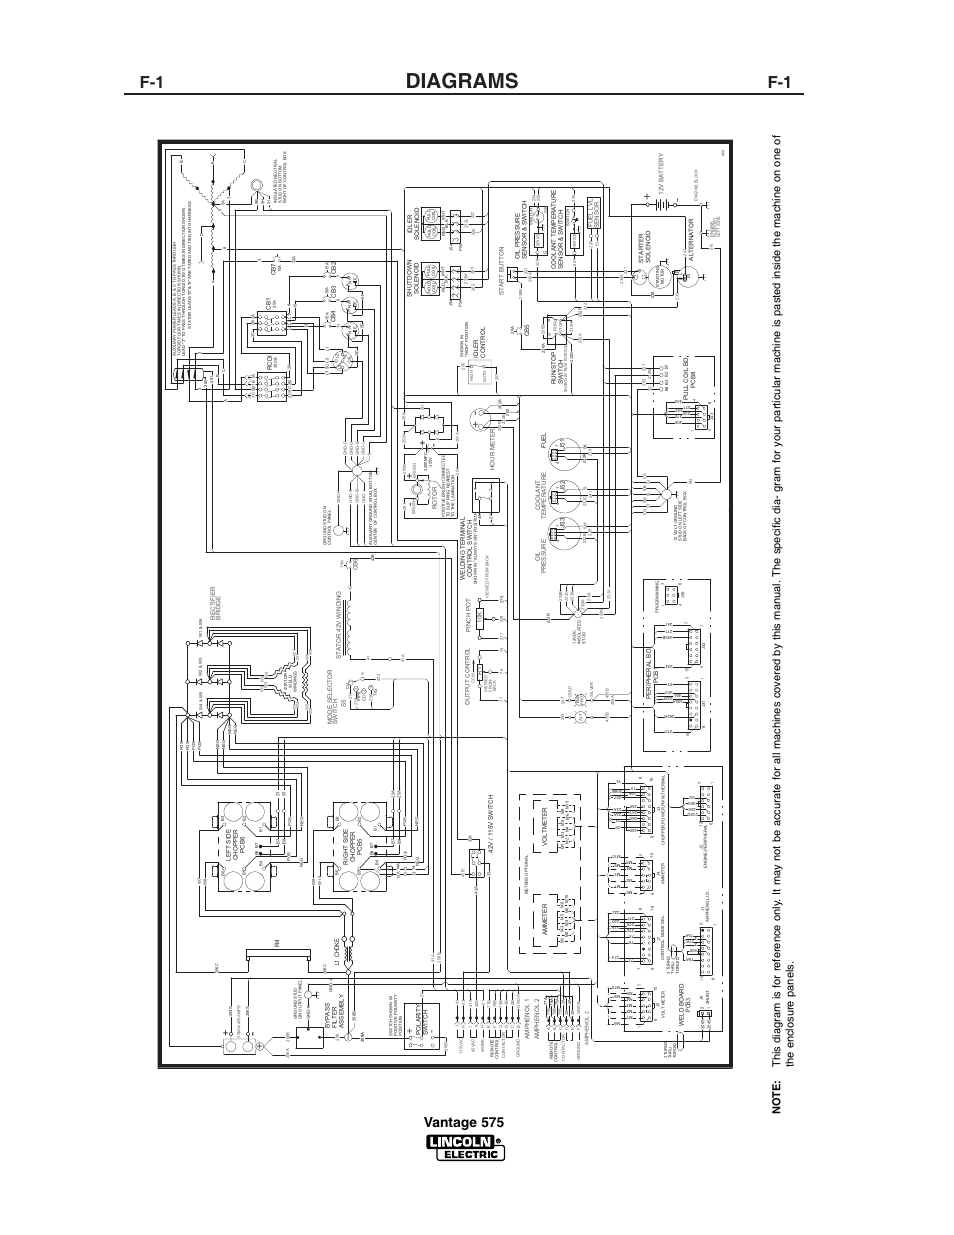 lincoln vantage 575 wiring diagram